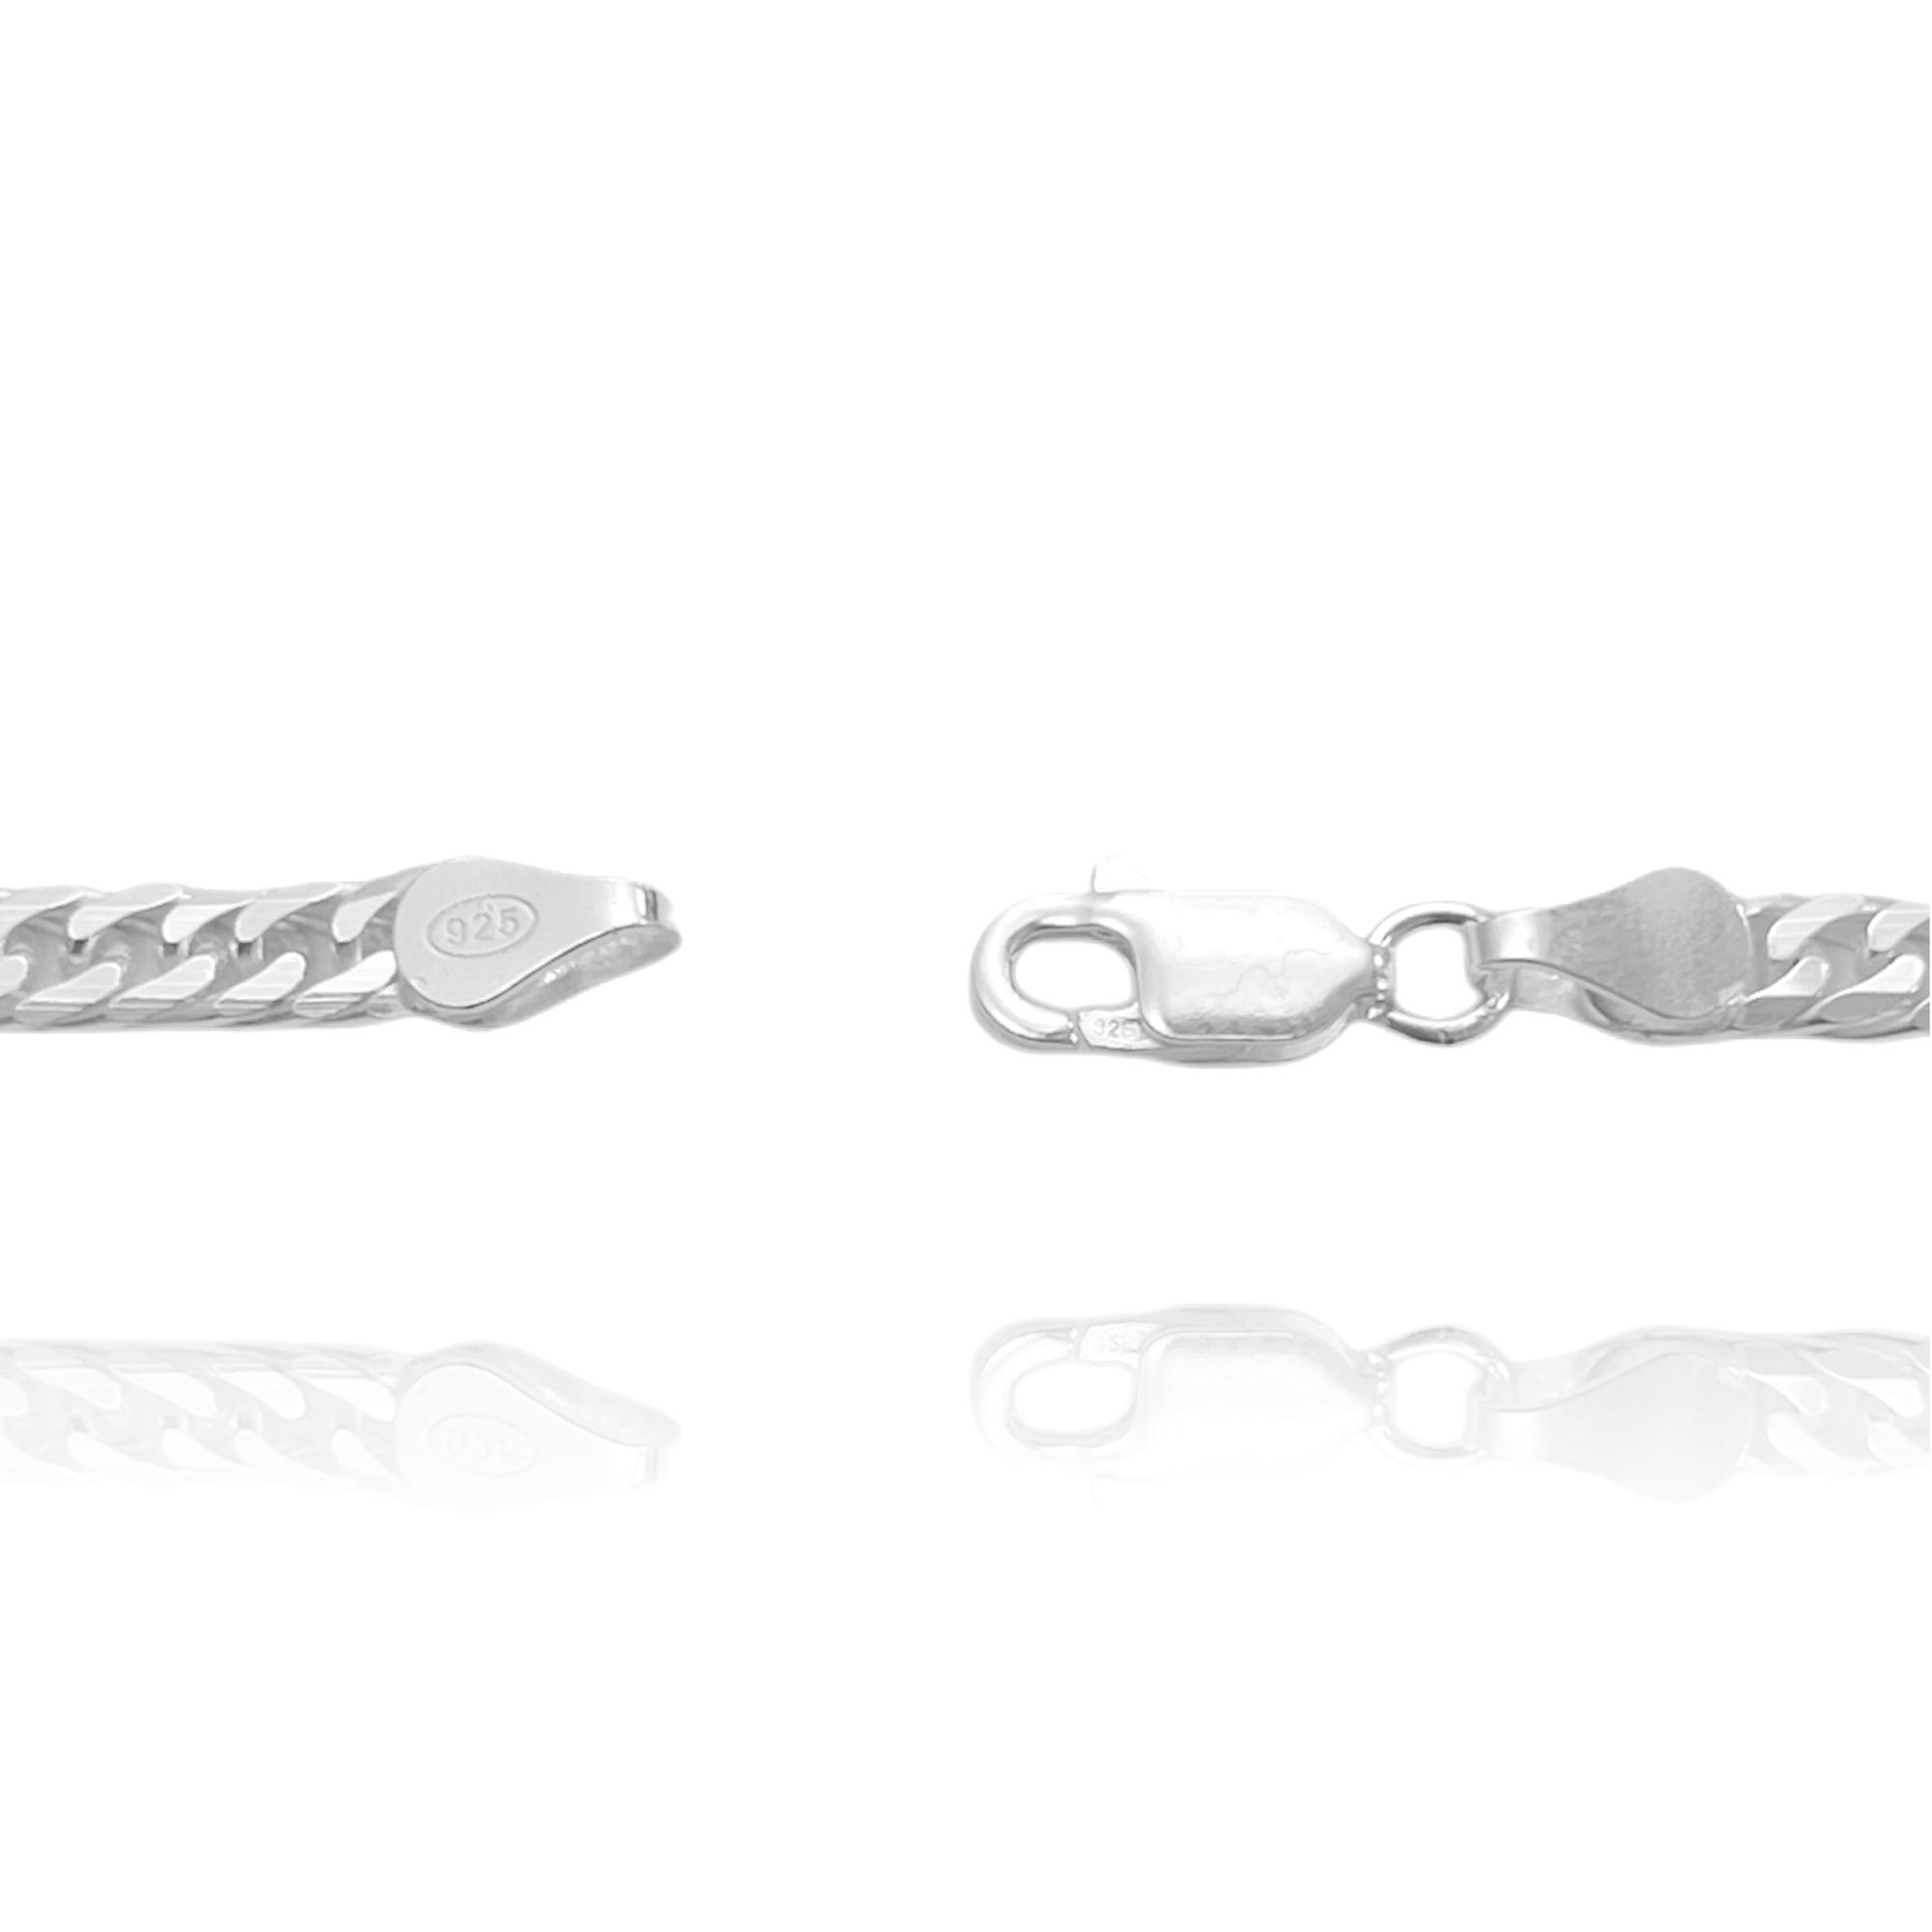 Corrente Double Grumet 3,5mm 70cm (17g) (Prata 925 Italiana)